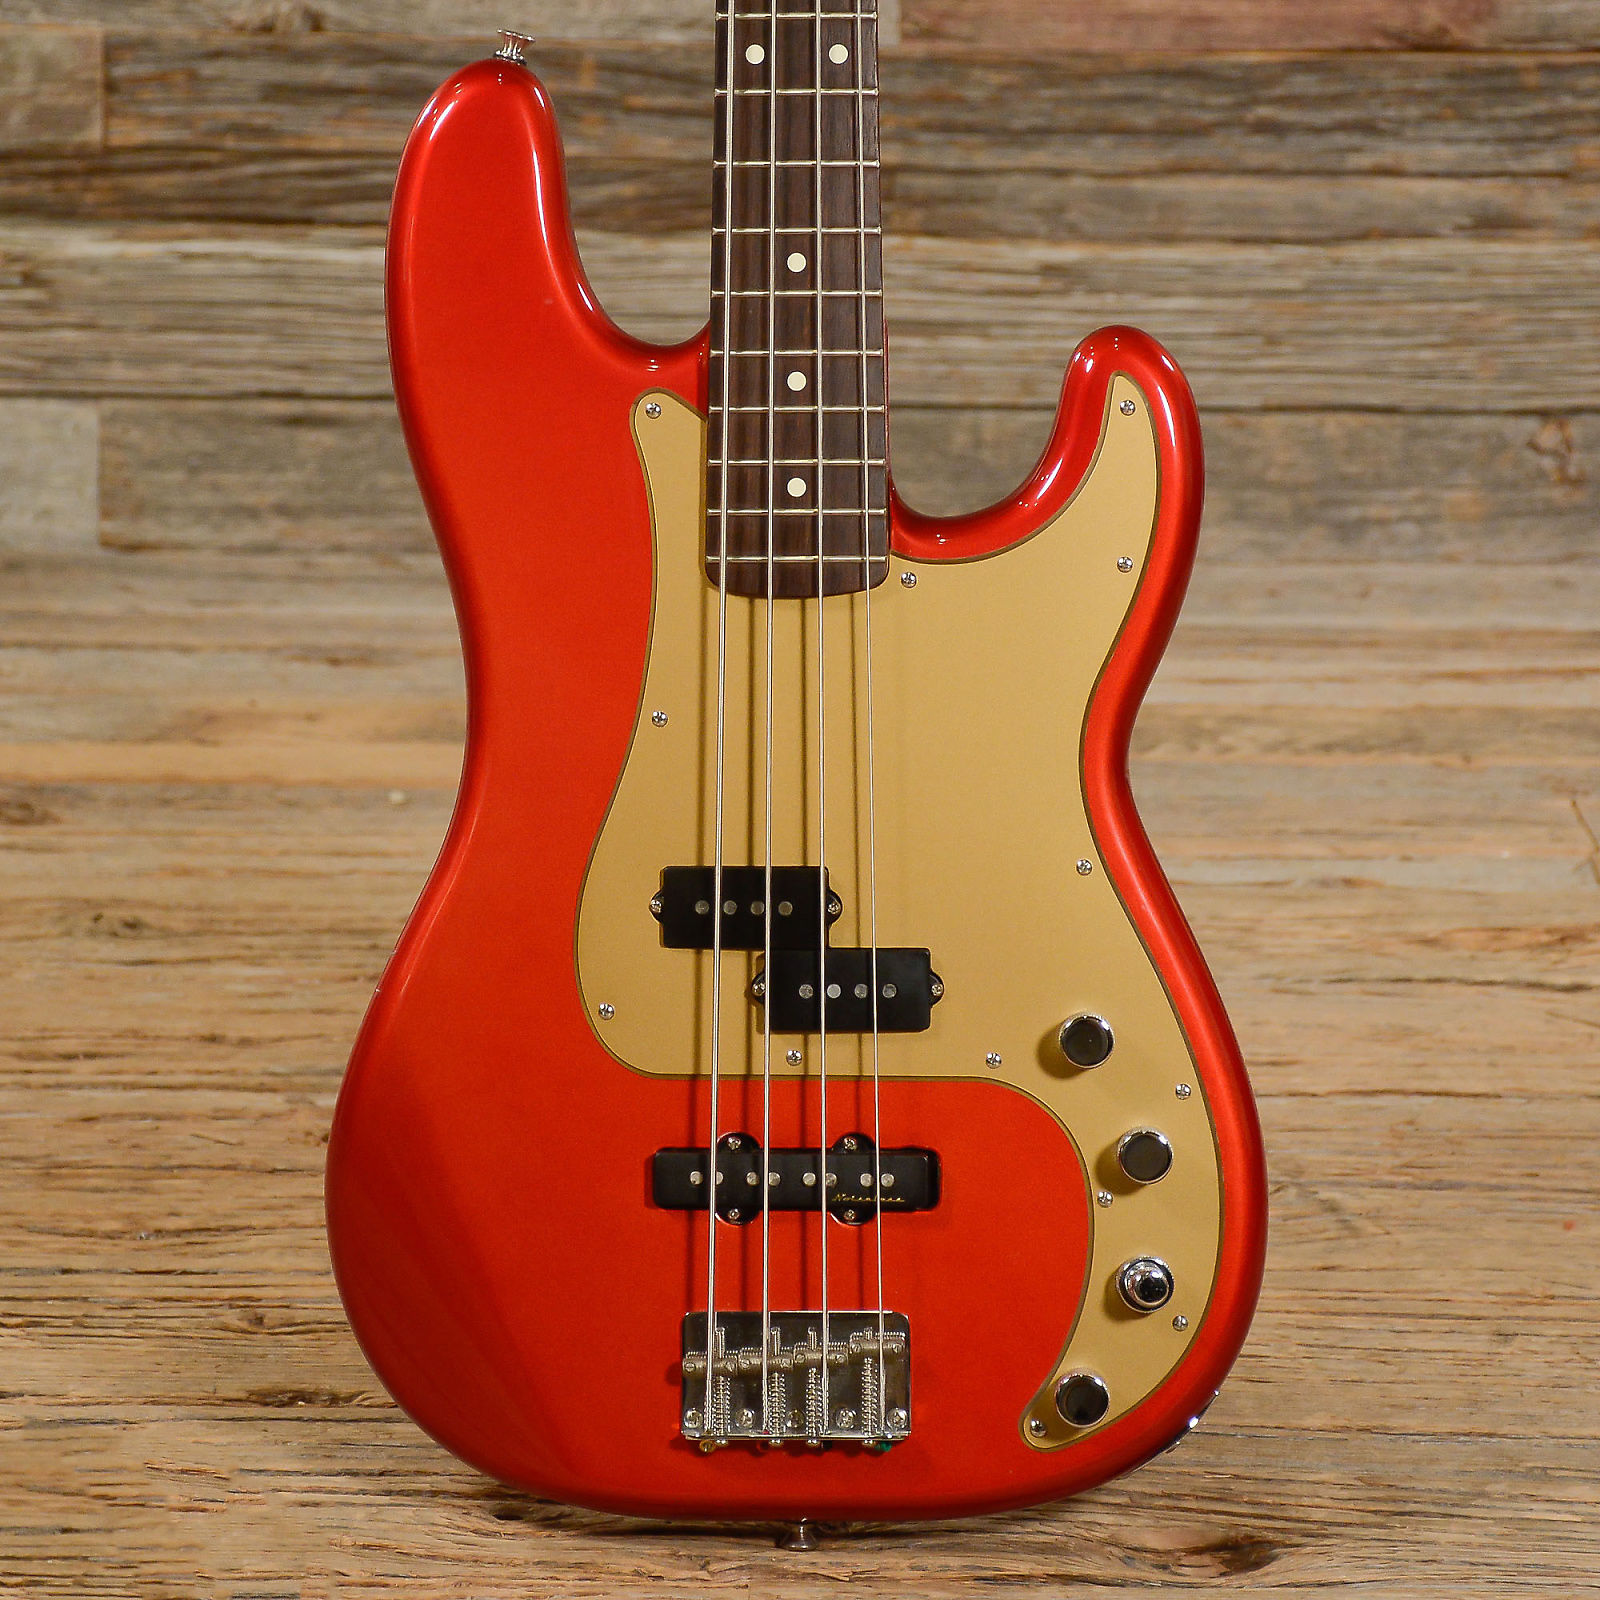 fender american special precision bass red reverb. Black Bedroom Furniture Sets. Home Design Ideas